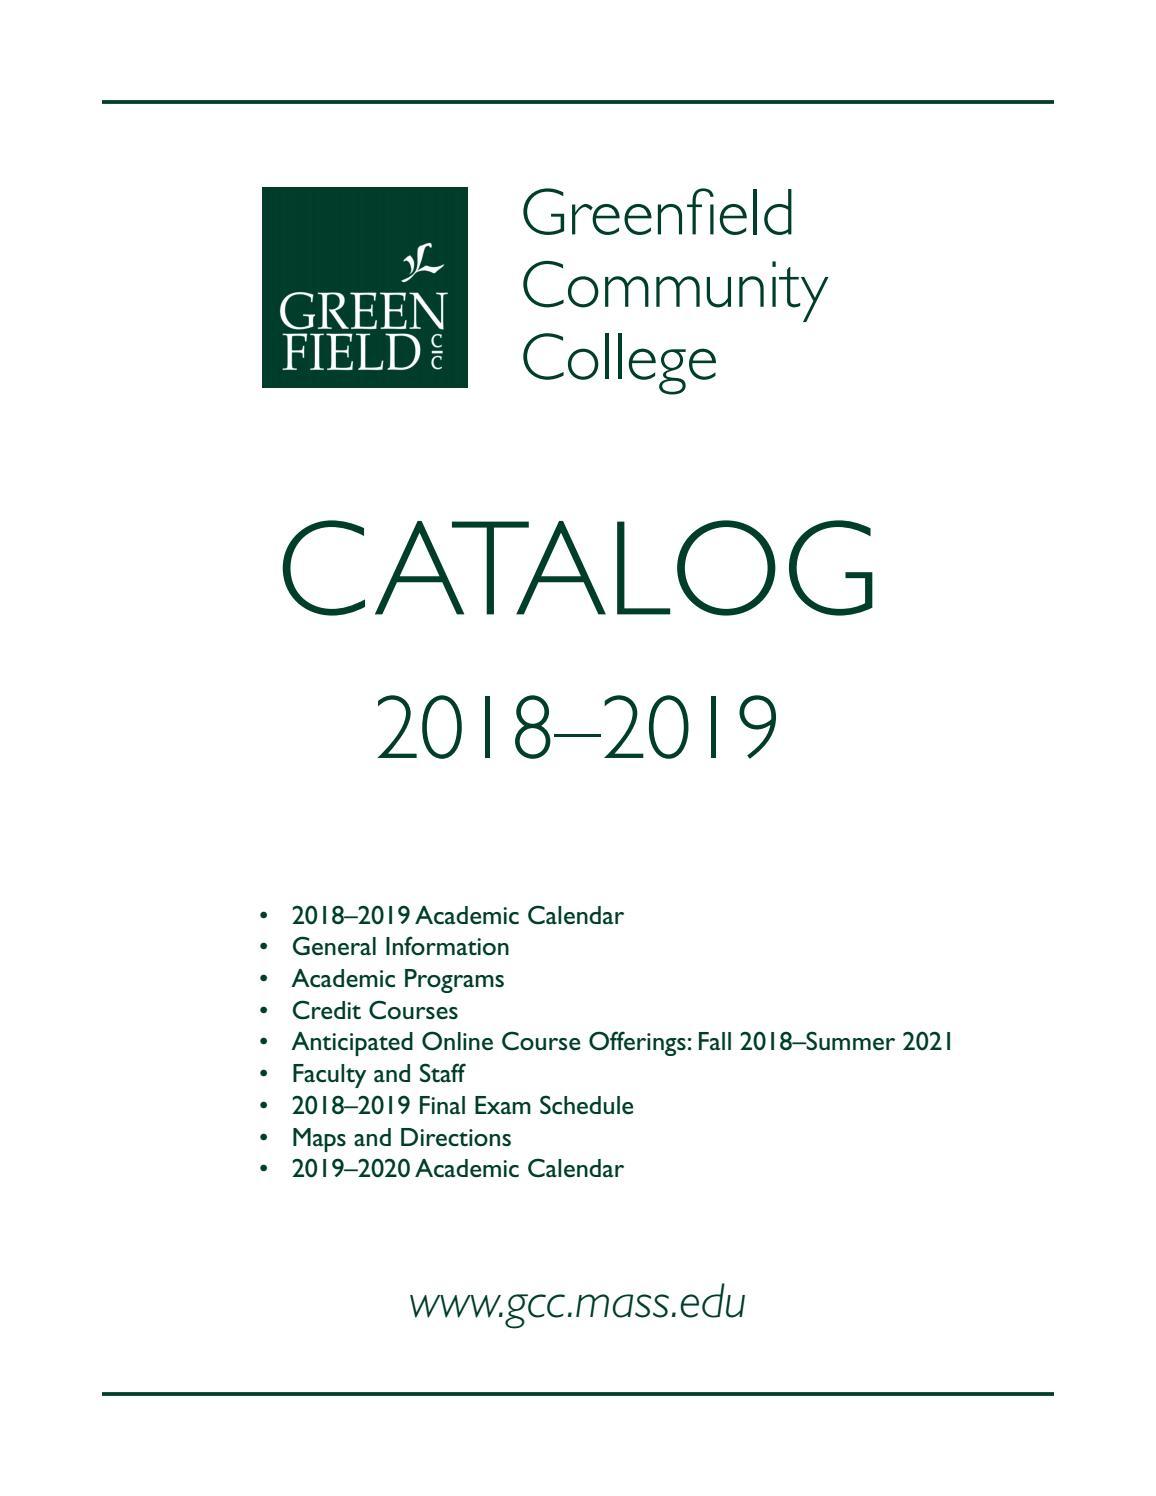 2018 19 Gcc Cataloggreenfield Community College – Issuu Inside University Of Southern Maine Academic Calendar 2021